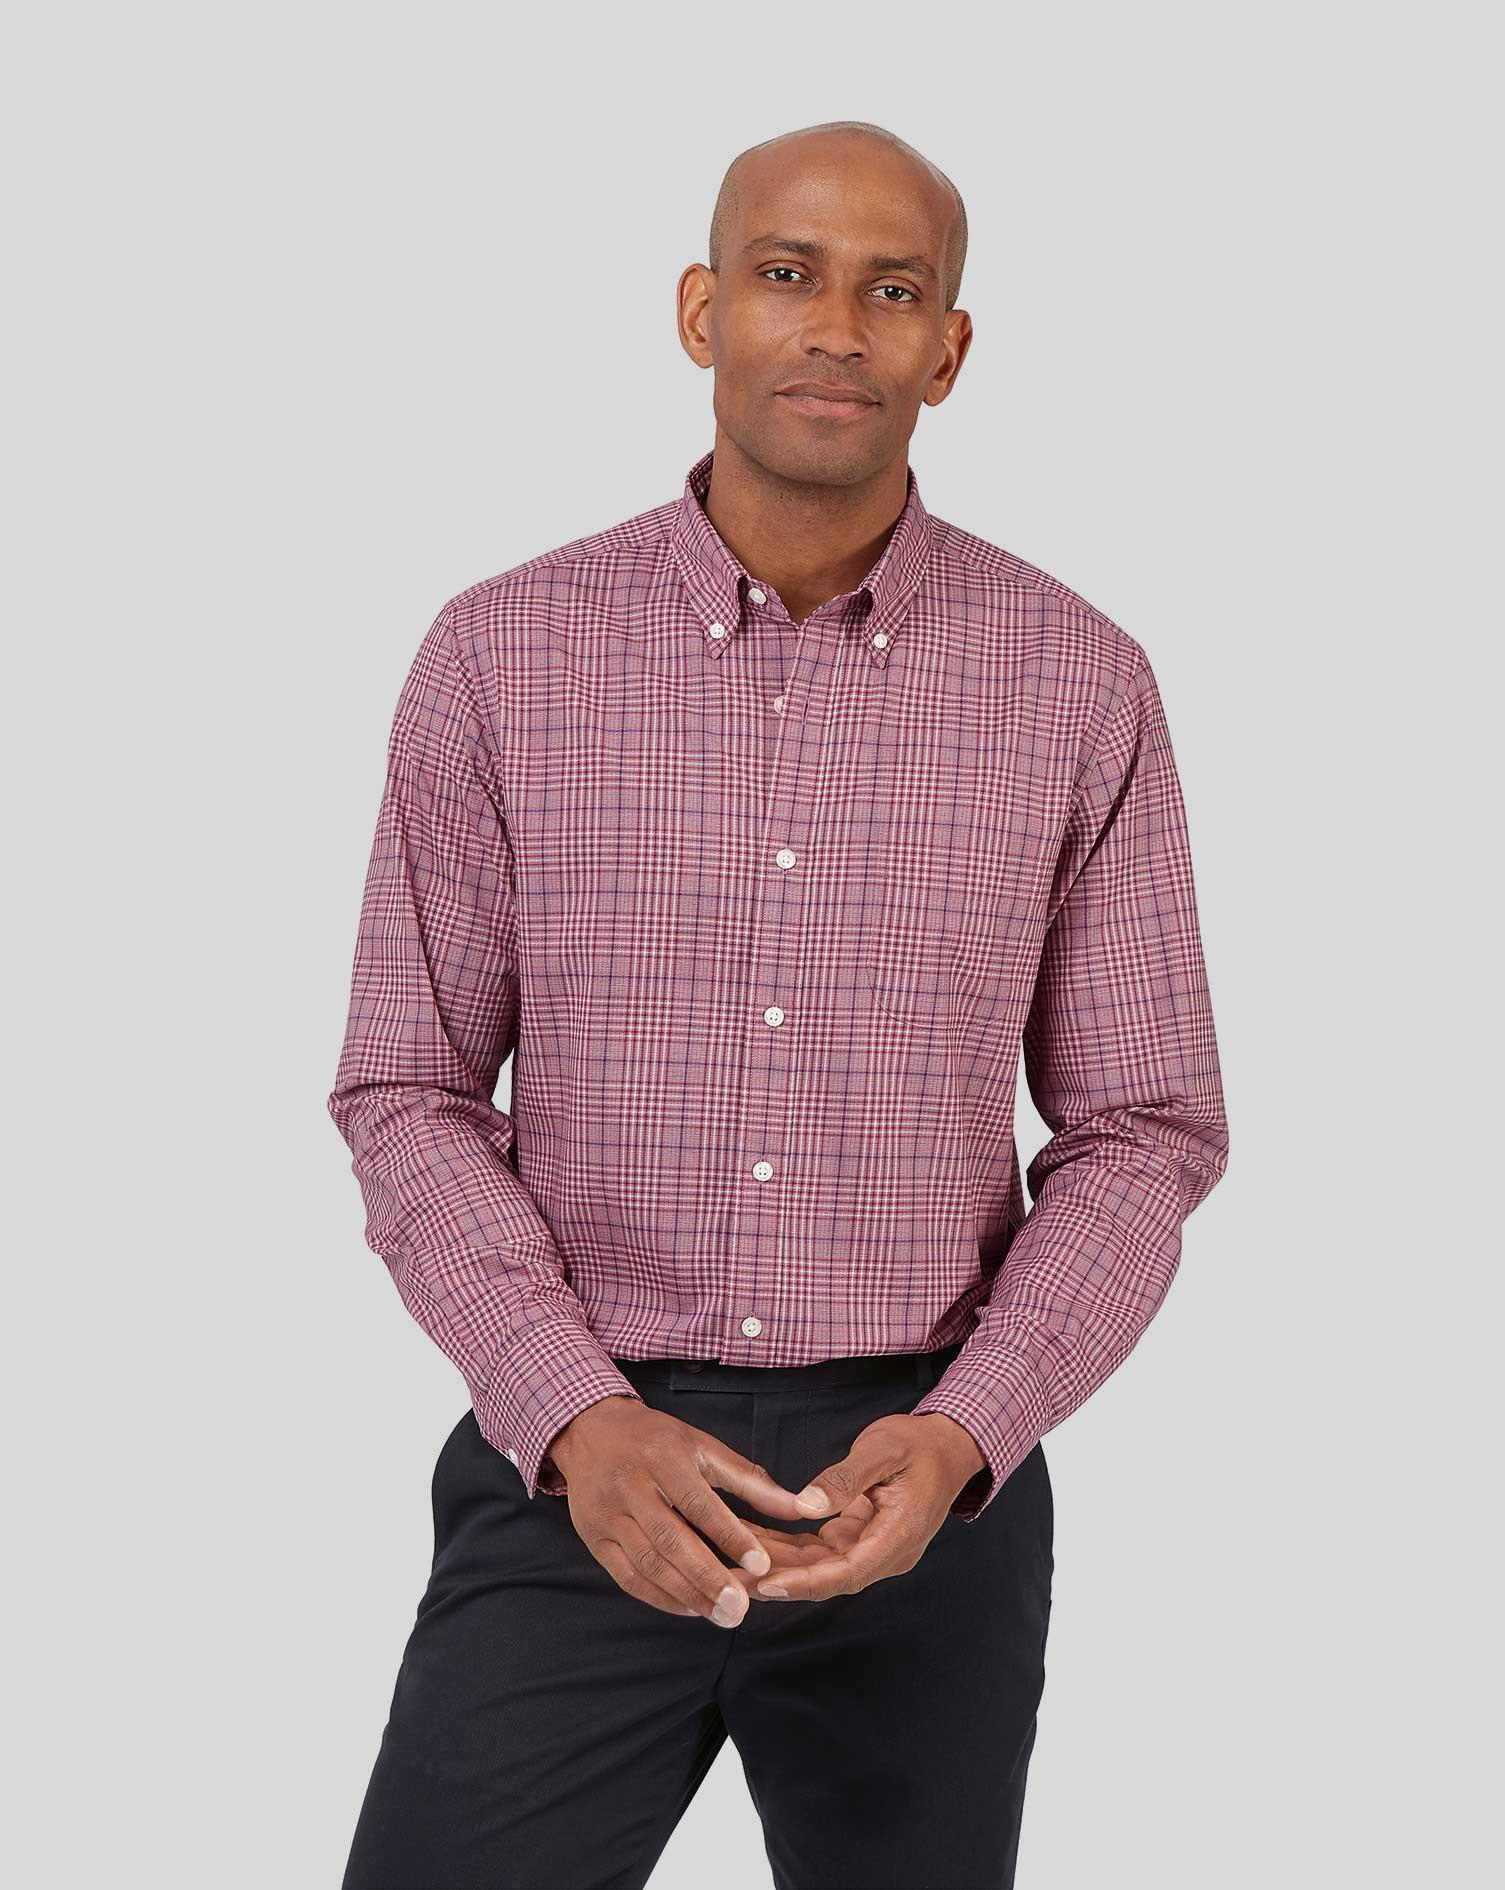 Image of Charles Tyrwhitt Button-Down Collar Non-Iron Stretch Poplin Large Check Cotton Shirt - Berry Single Cuff Size XL by Charles Tyrwhitt